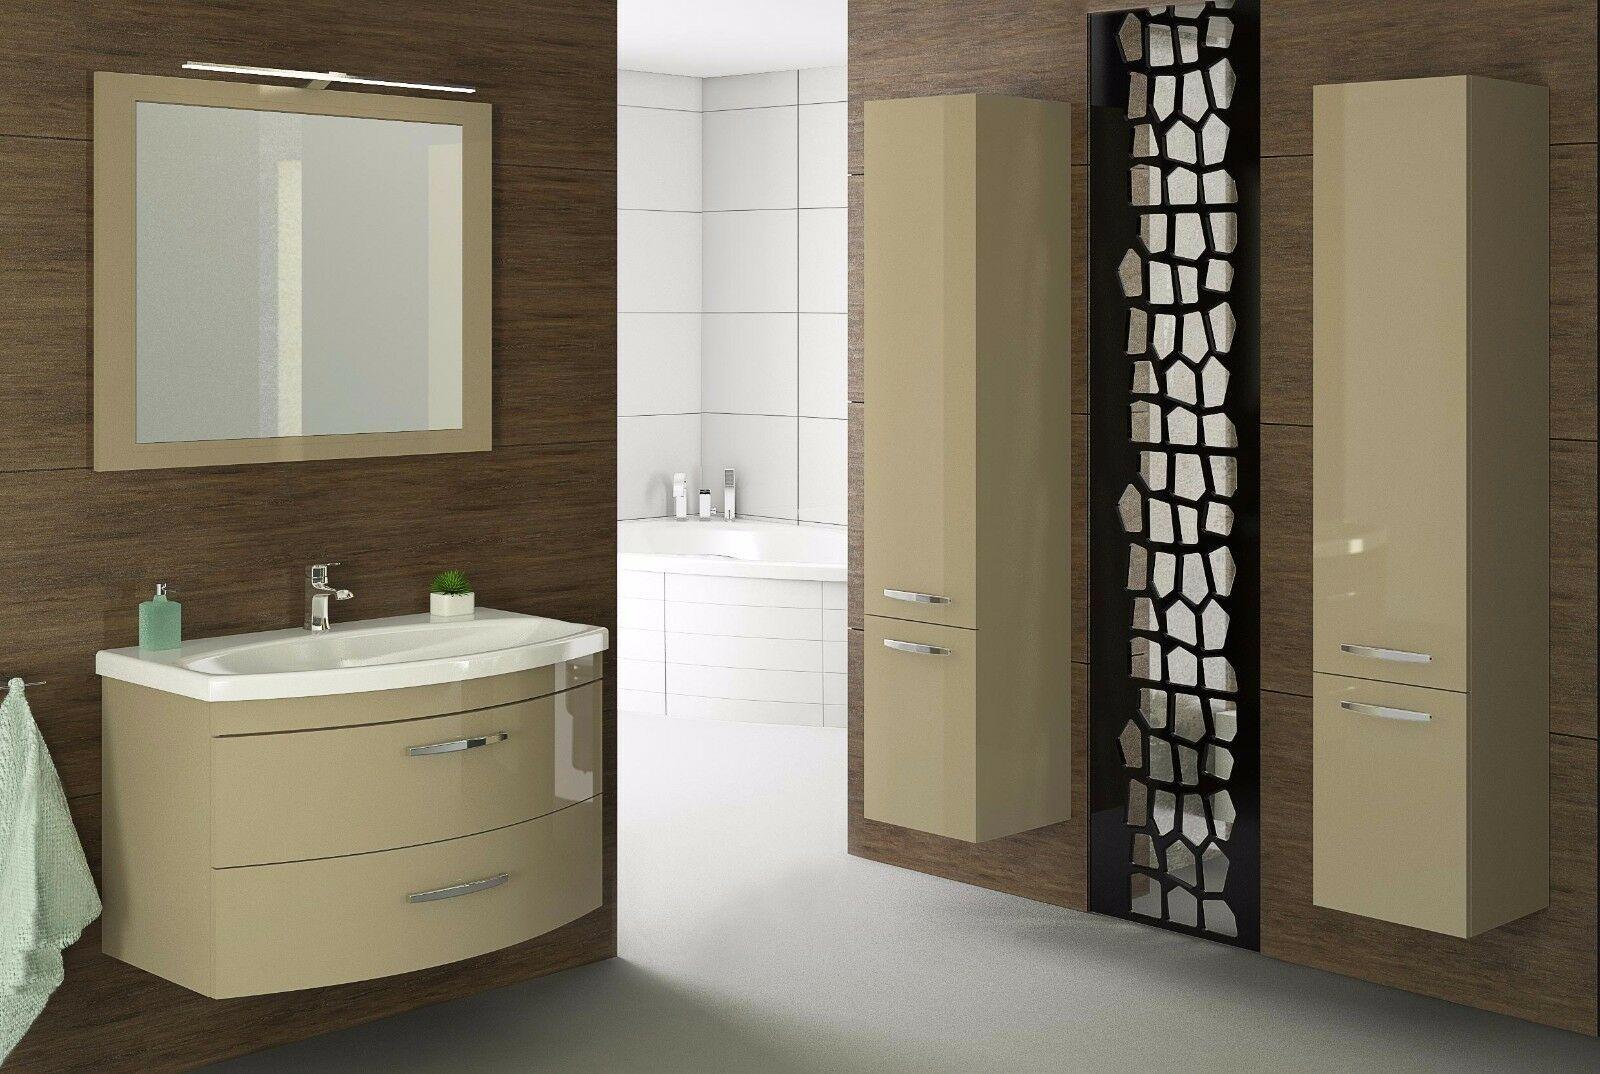 Badmobel Set Vena 80 Cm Badezimmer Mobel Waschbecken Capuccino Hochglanz Led In 2020 Badezimmer Mobel Waschbecken Badezimmer